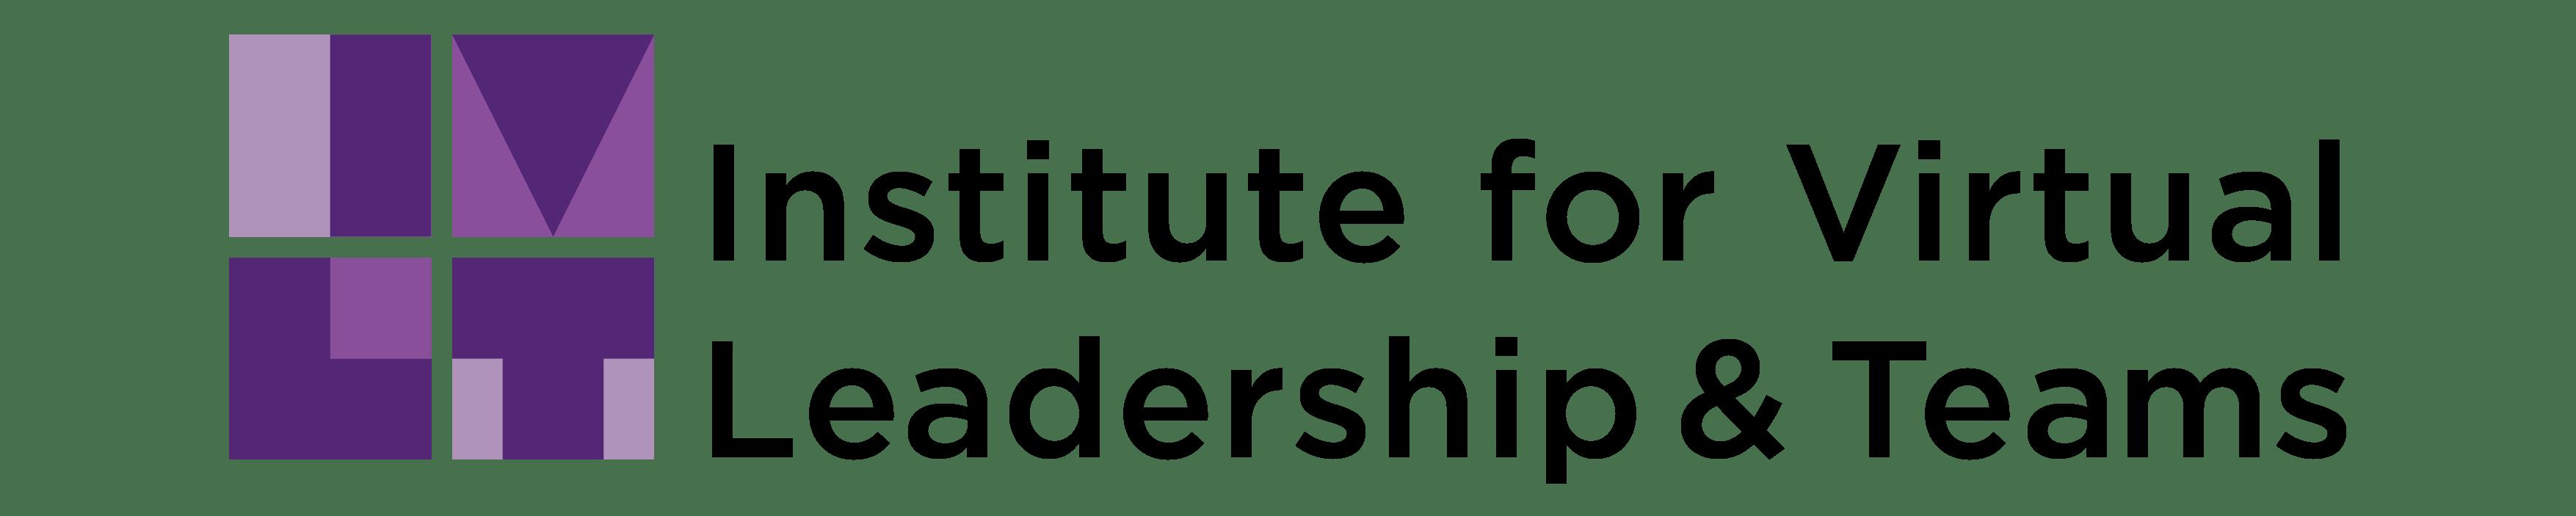 Institute for Virtual Leadership & Teams